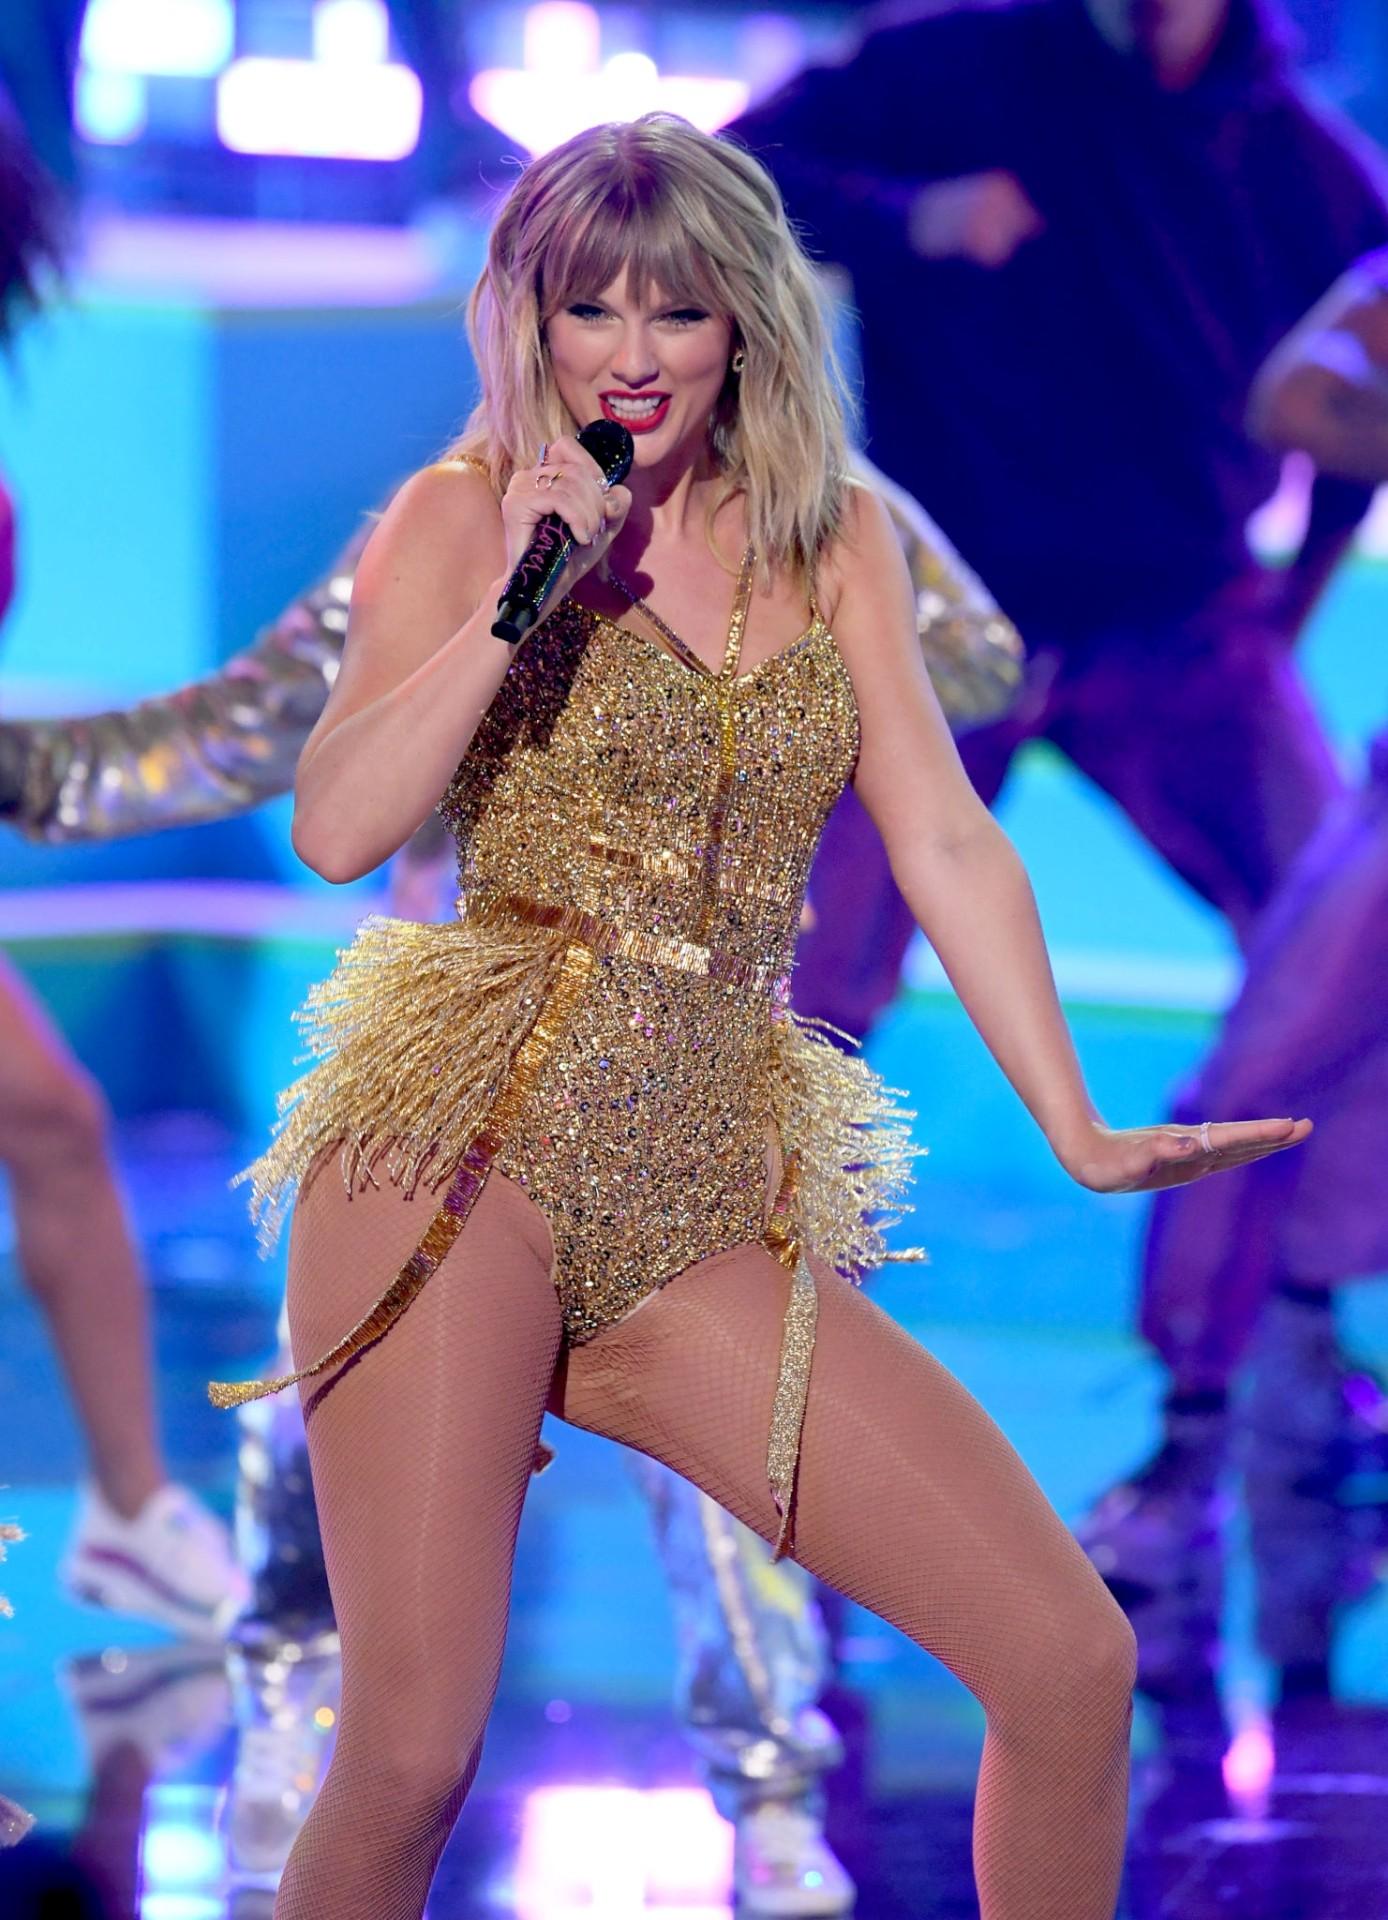 Taylor Swift Sexy Legs